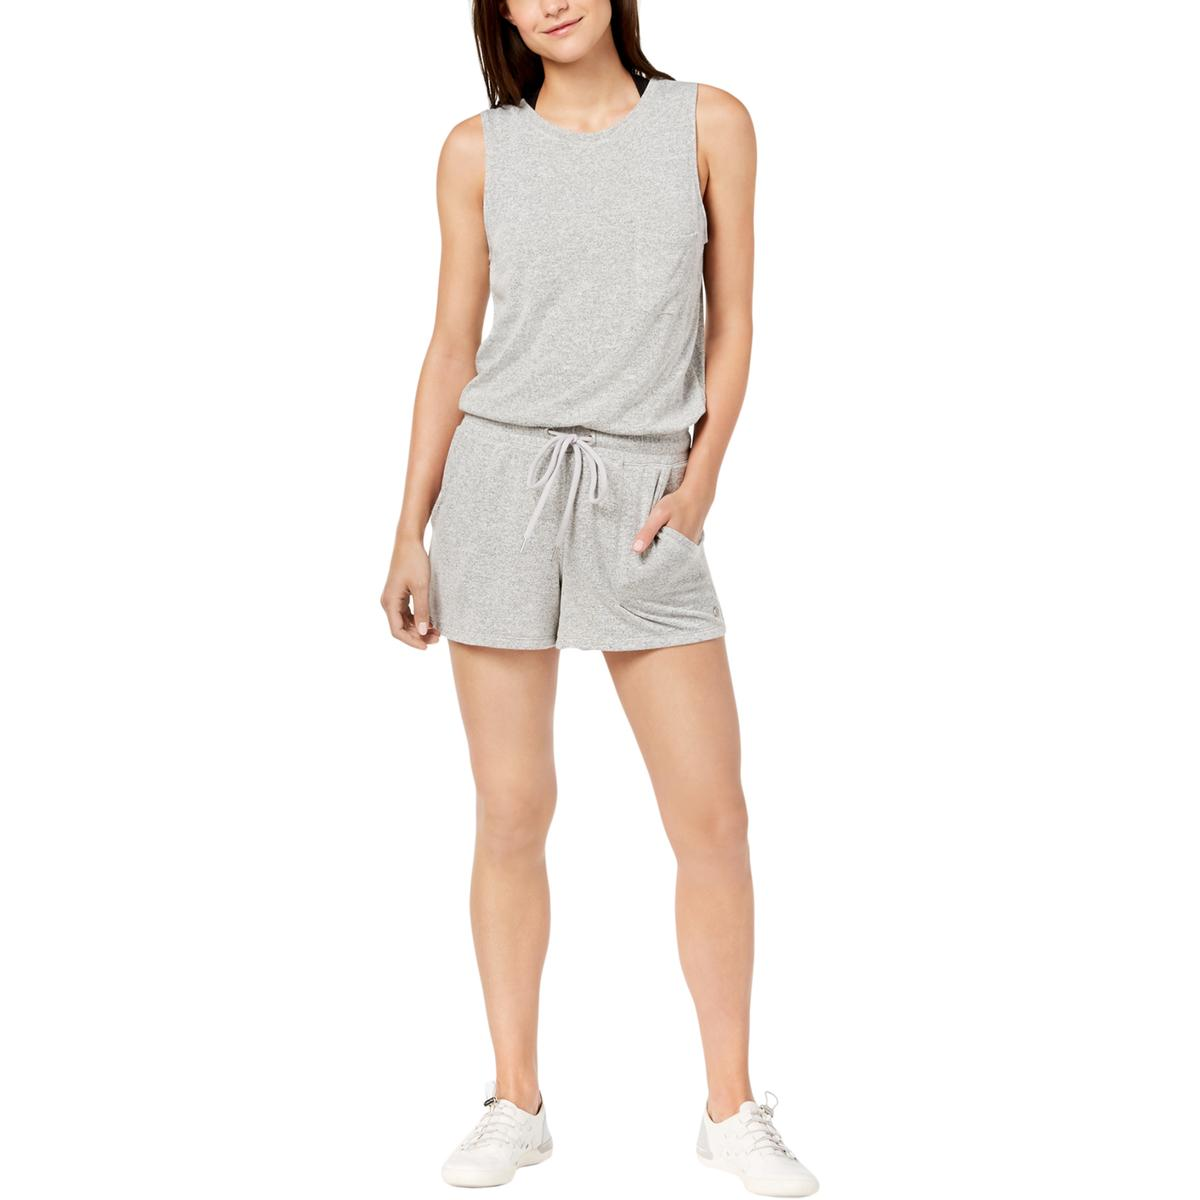 b316a4ed3b5b Calvin Klein Performance Womens Gray Workout Romper Athletic XL BHFO ...